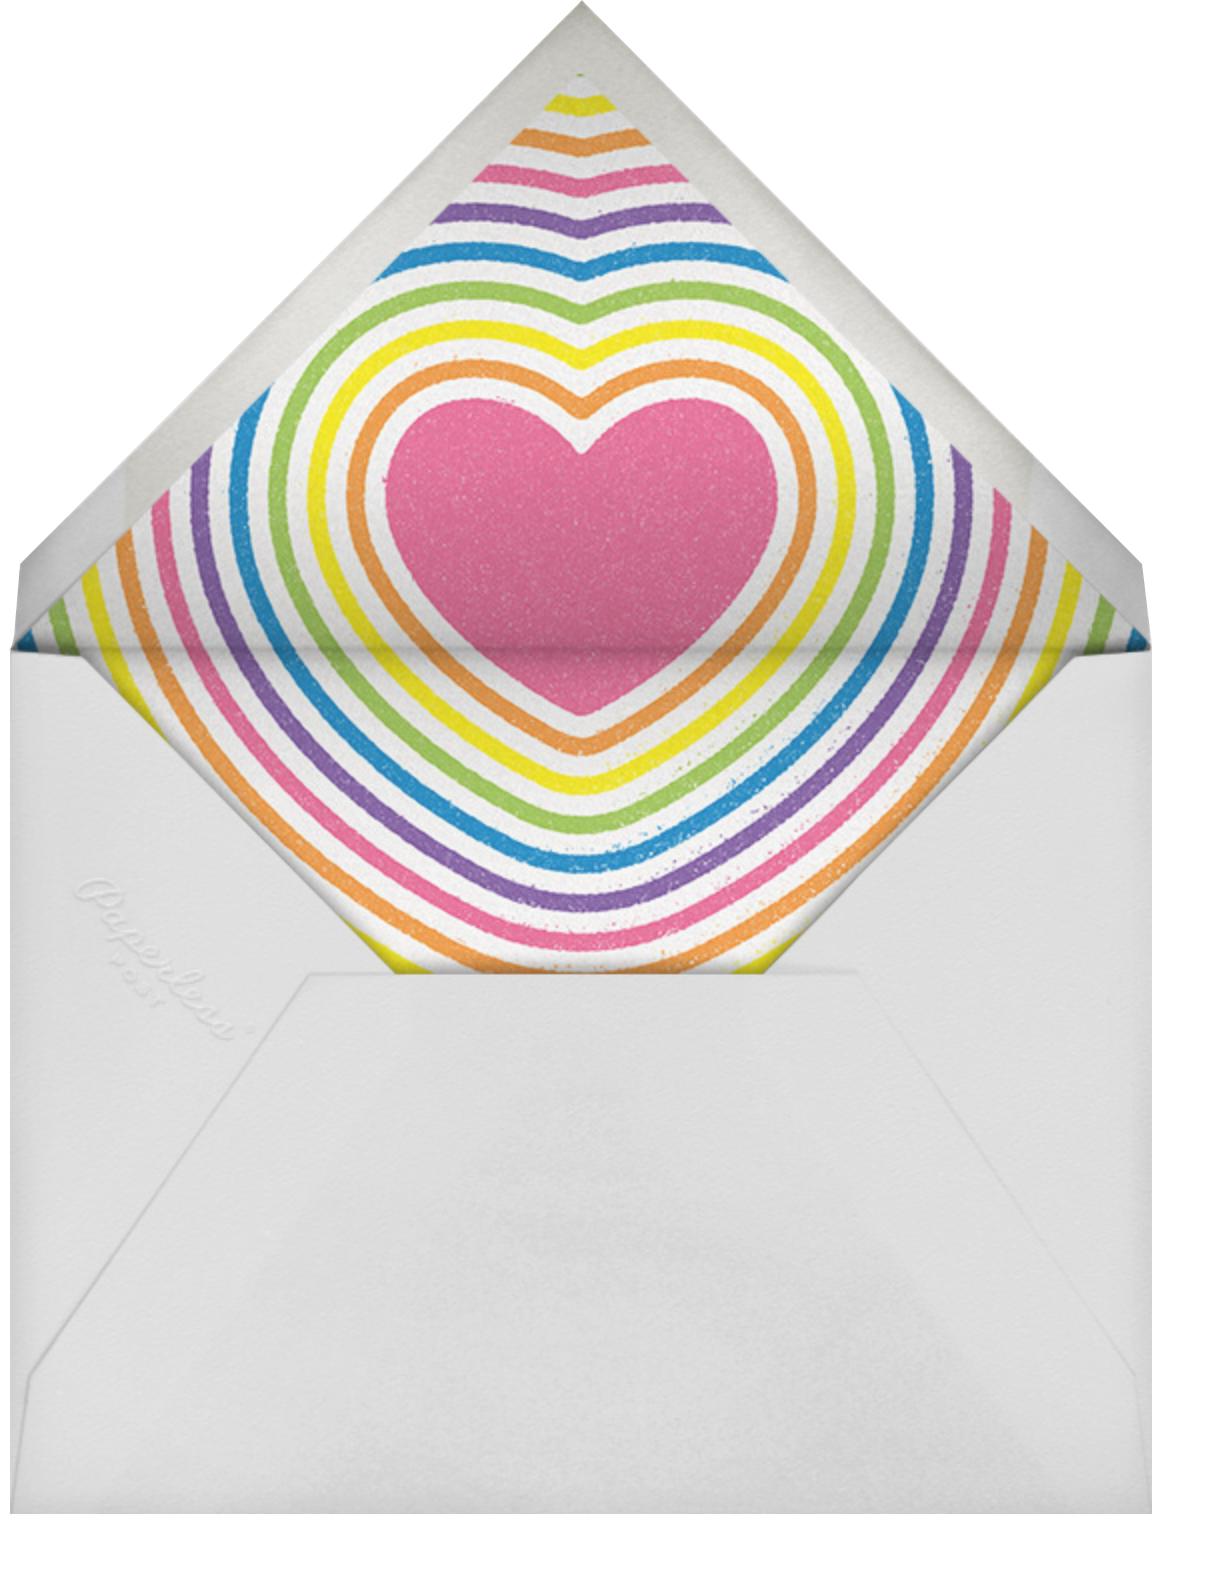 Round Rainbow Photo - Paperless Post - Envelope